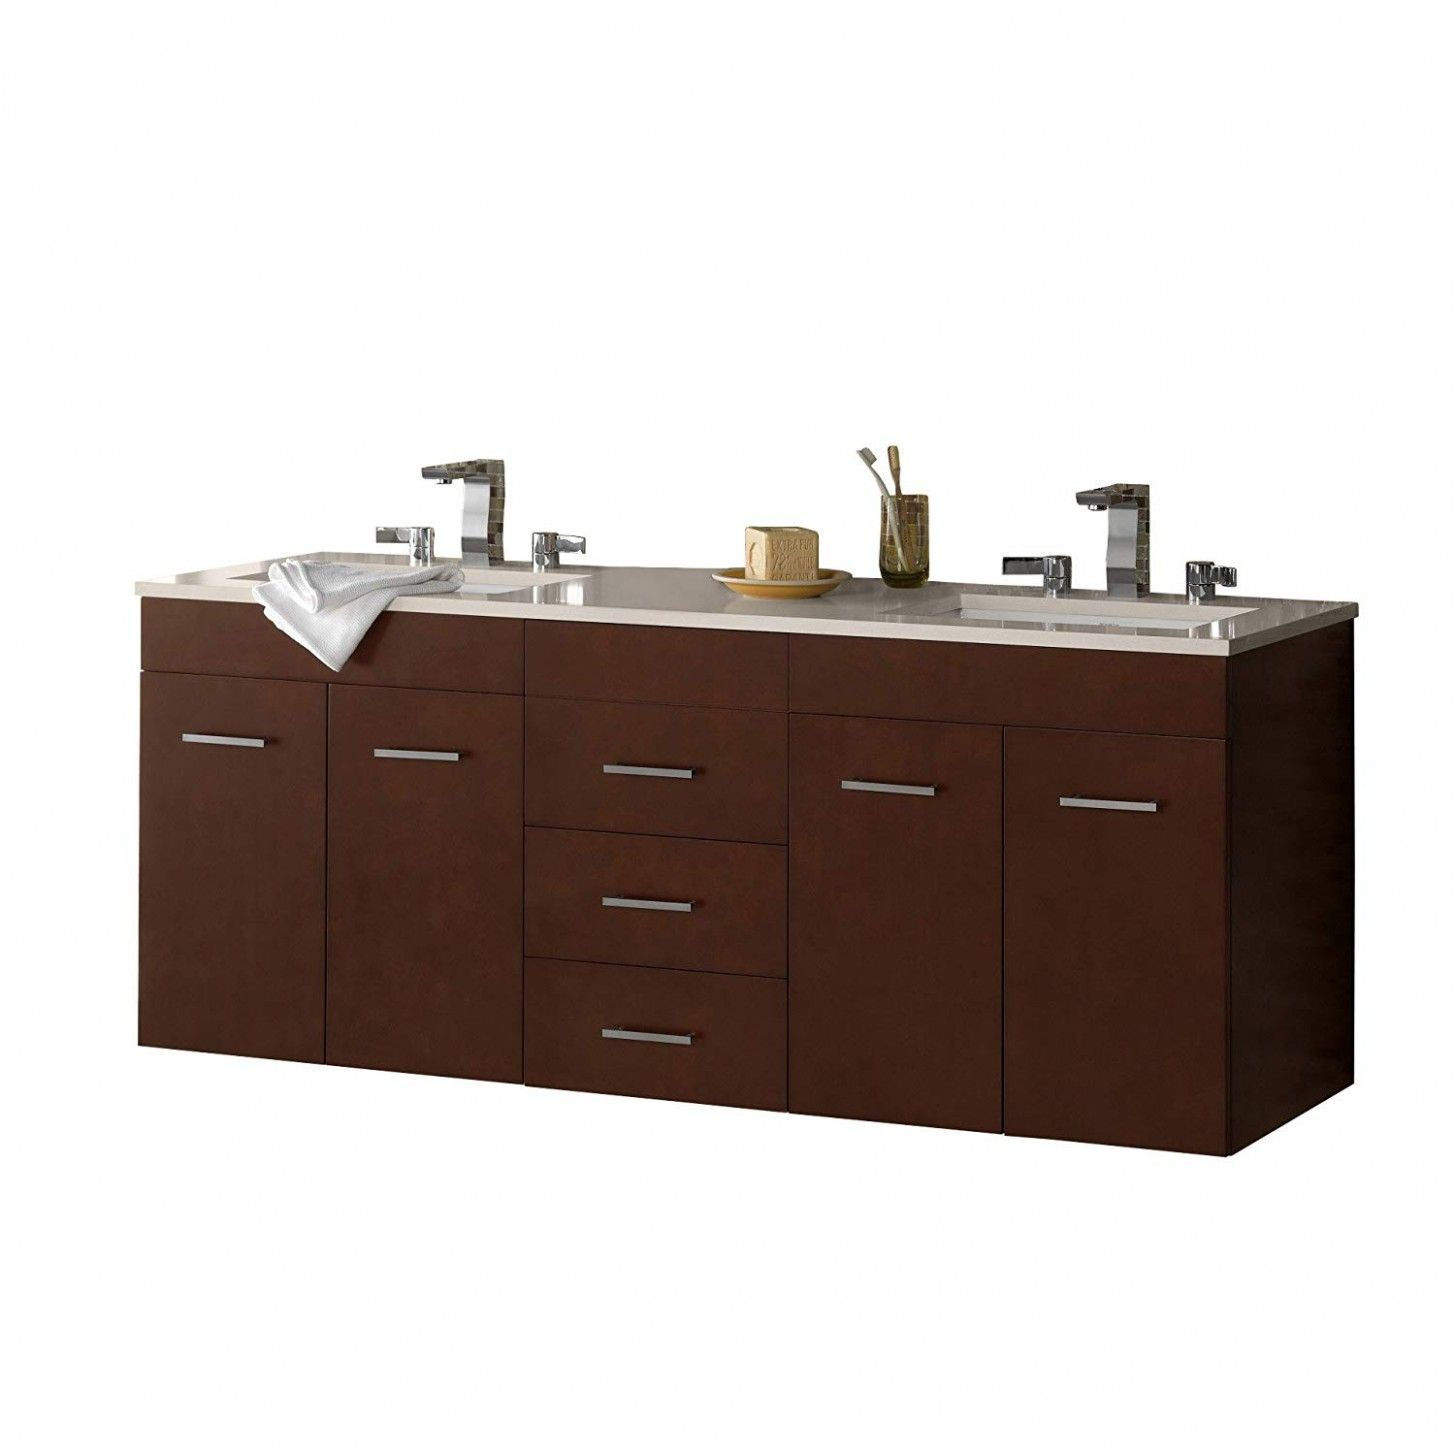 28++ Bathroom wall cabinets cherry wood best